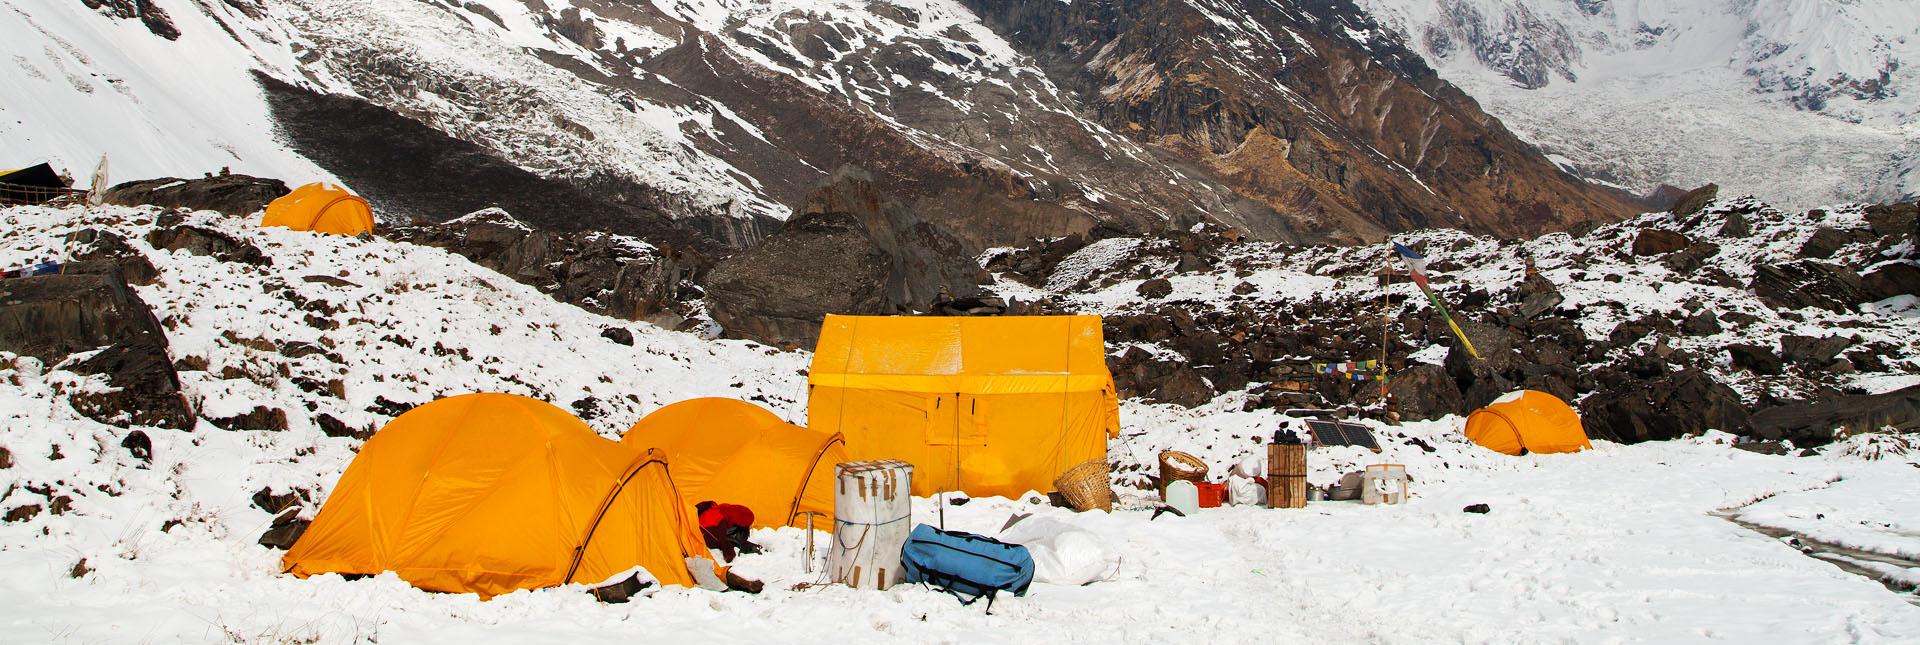 Campsite on the trek route